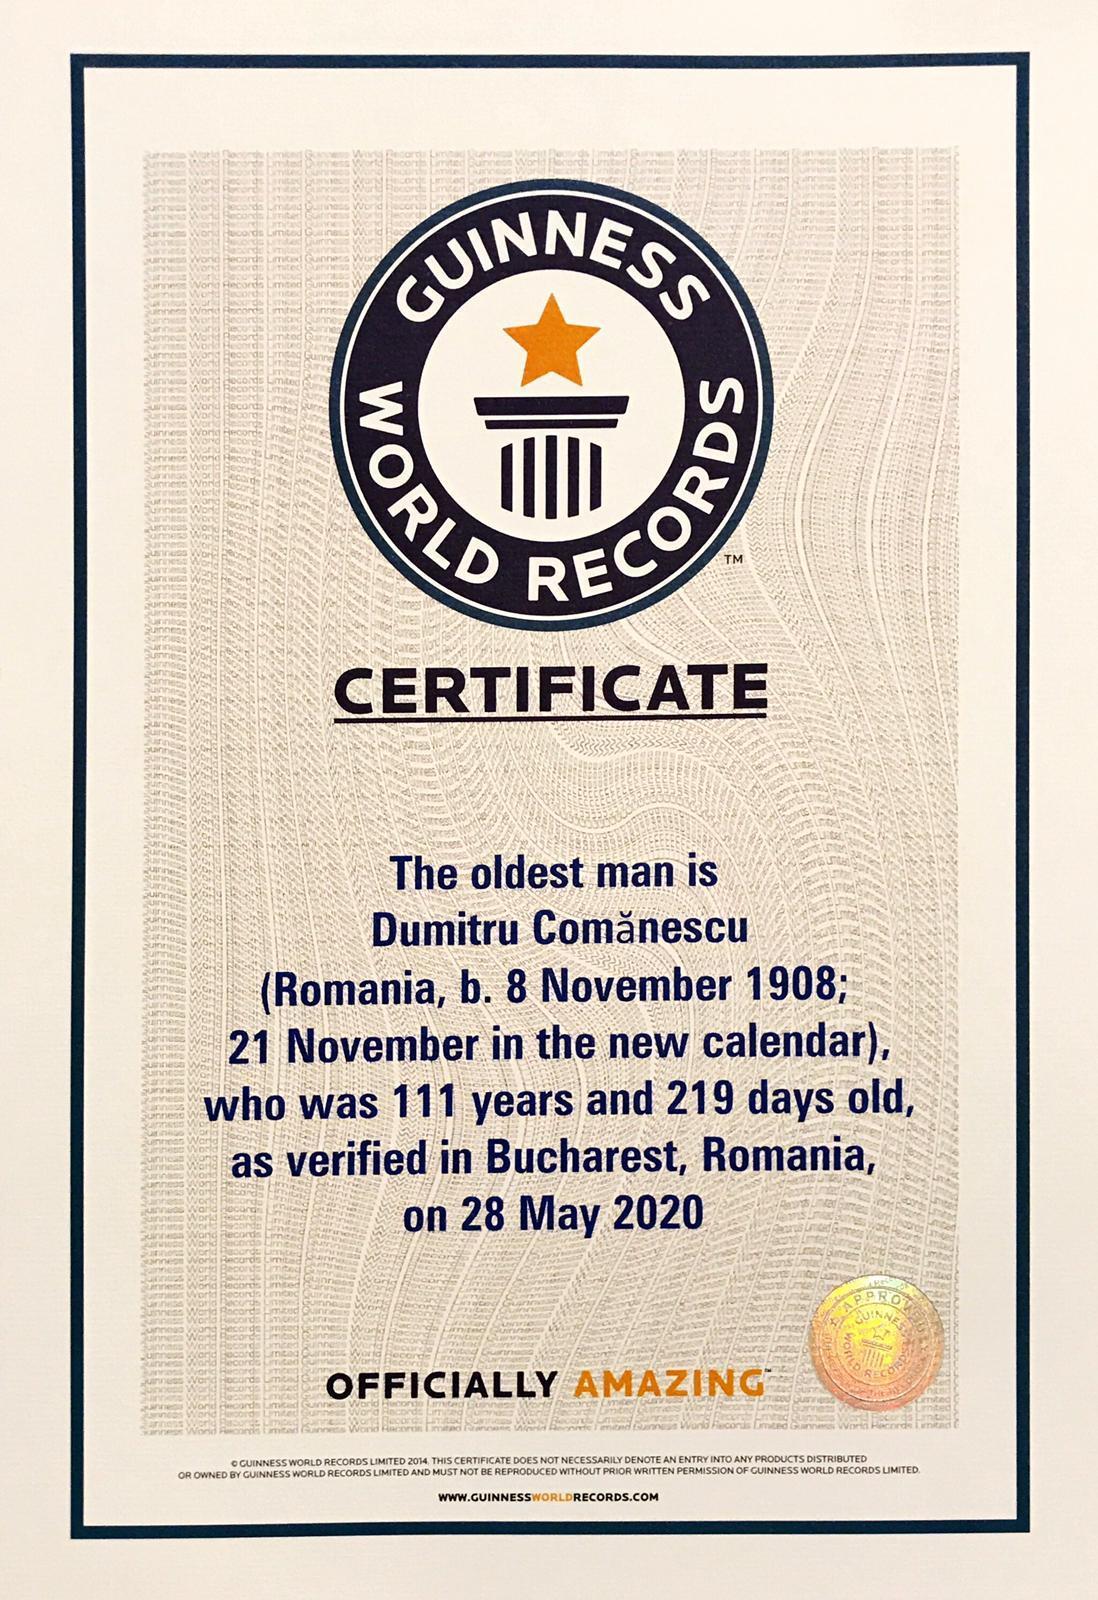 Certificat GUINNESS WORLD RECORDS DUMITRU COMANESCU